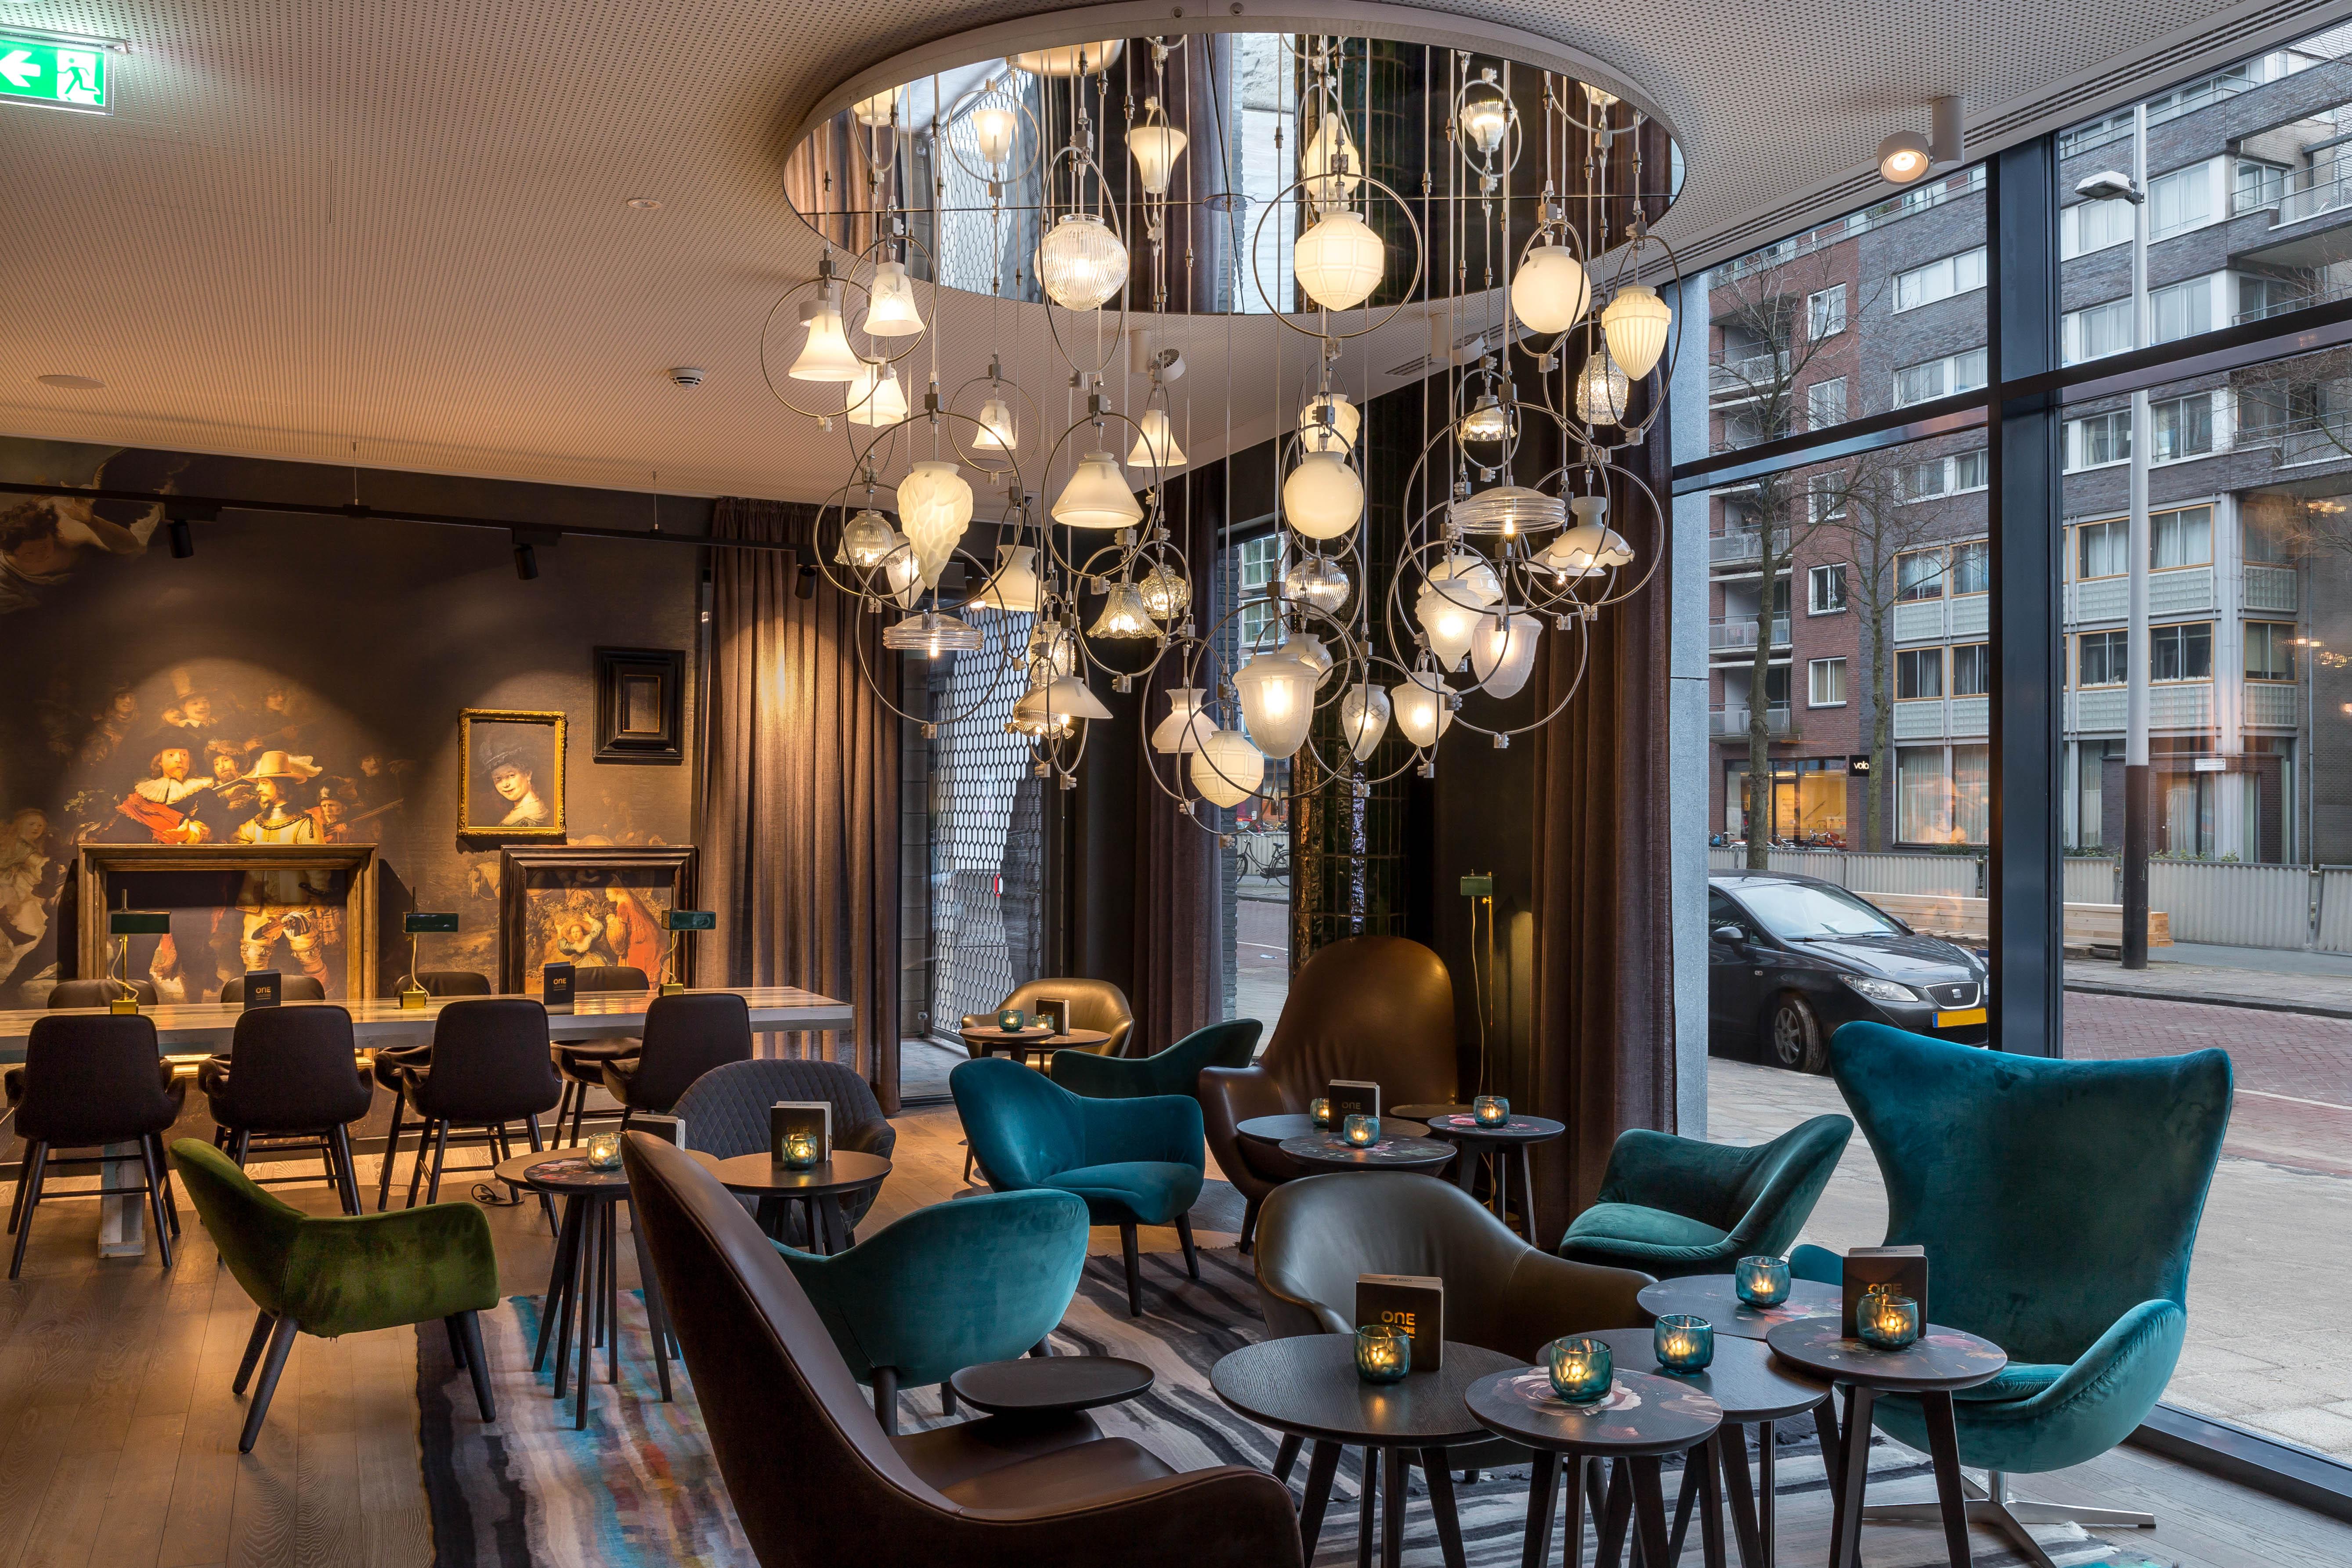 Hotels Amsterdam Motel One Gunstiges Design Hotel Amsterdam